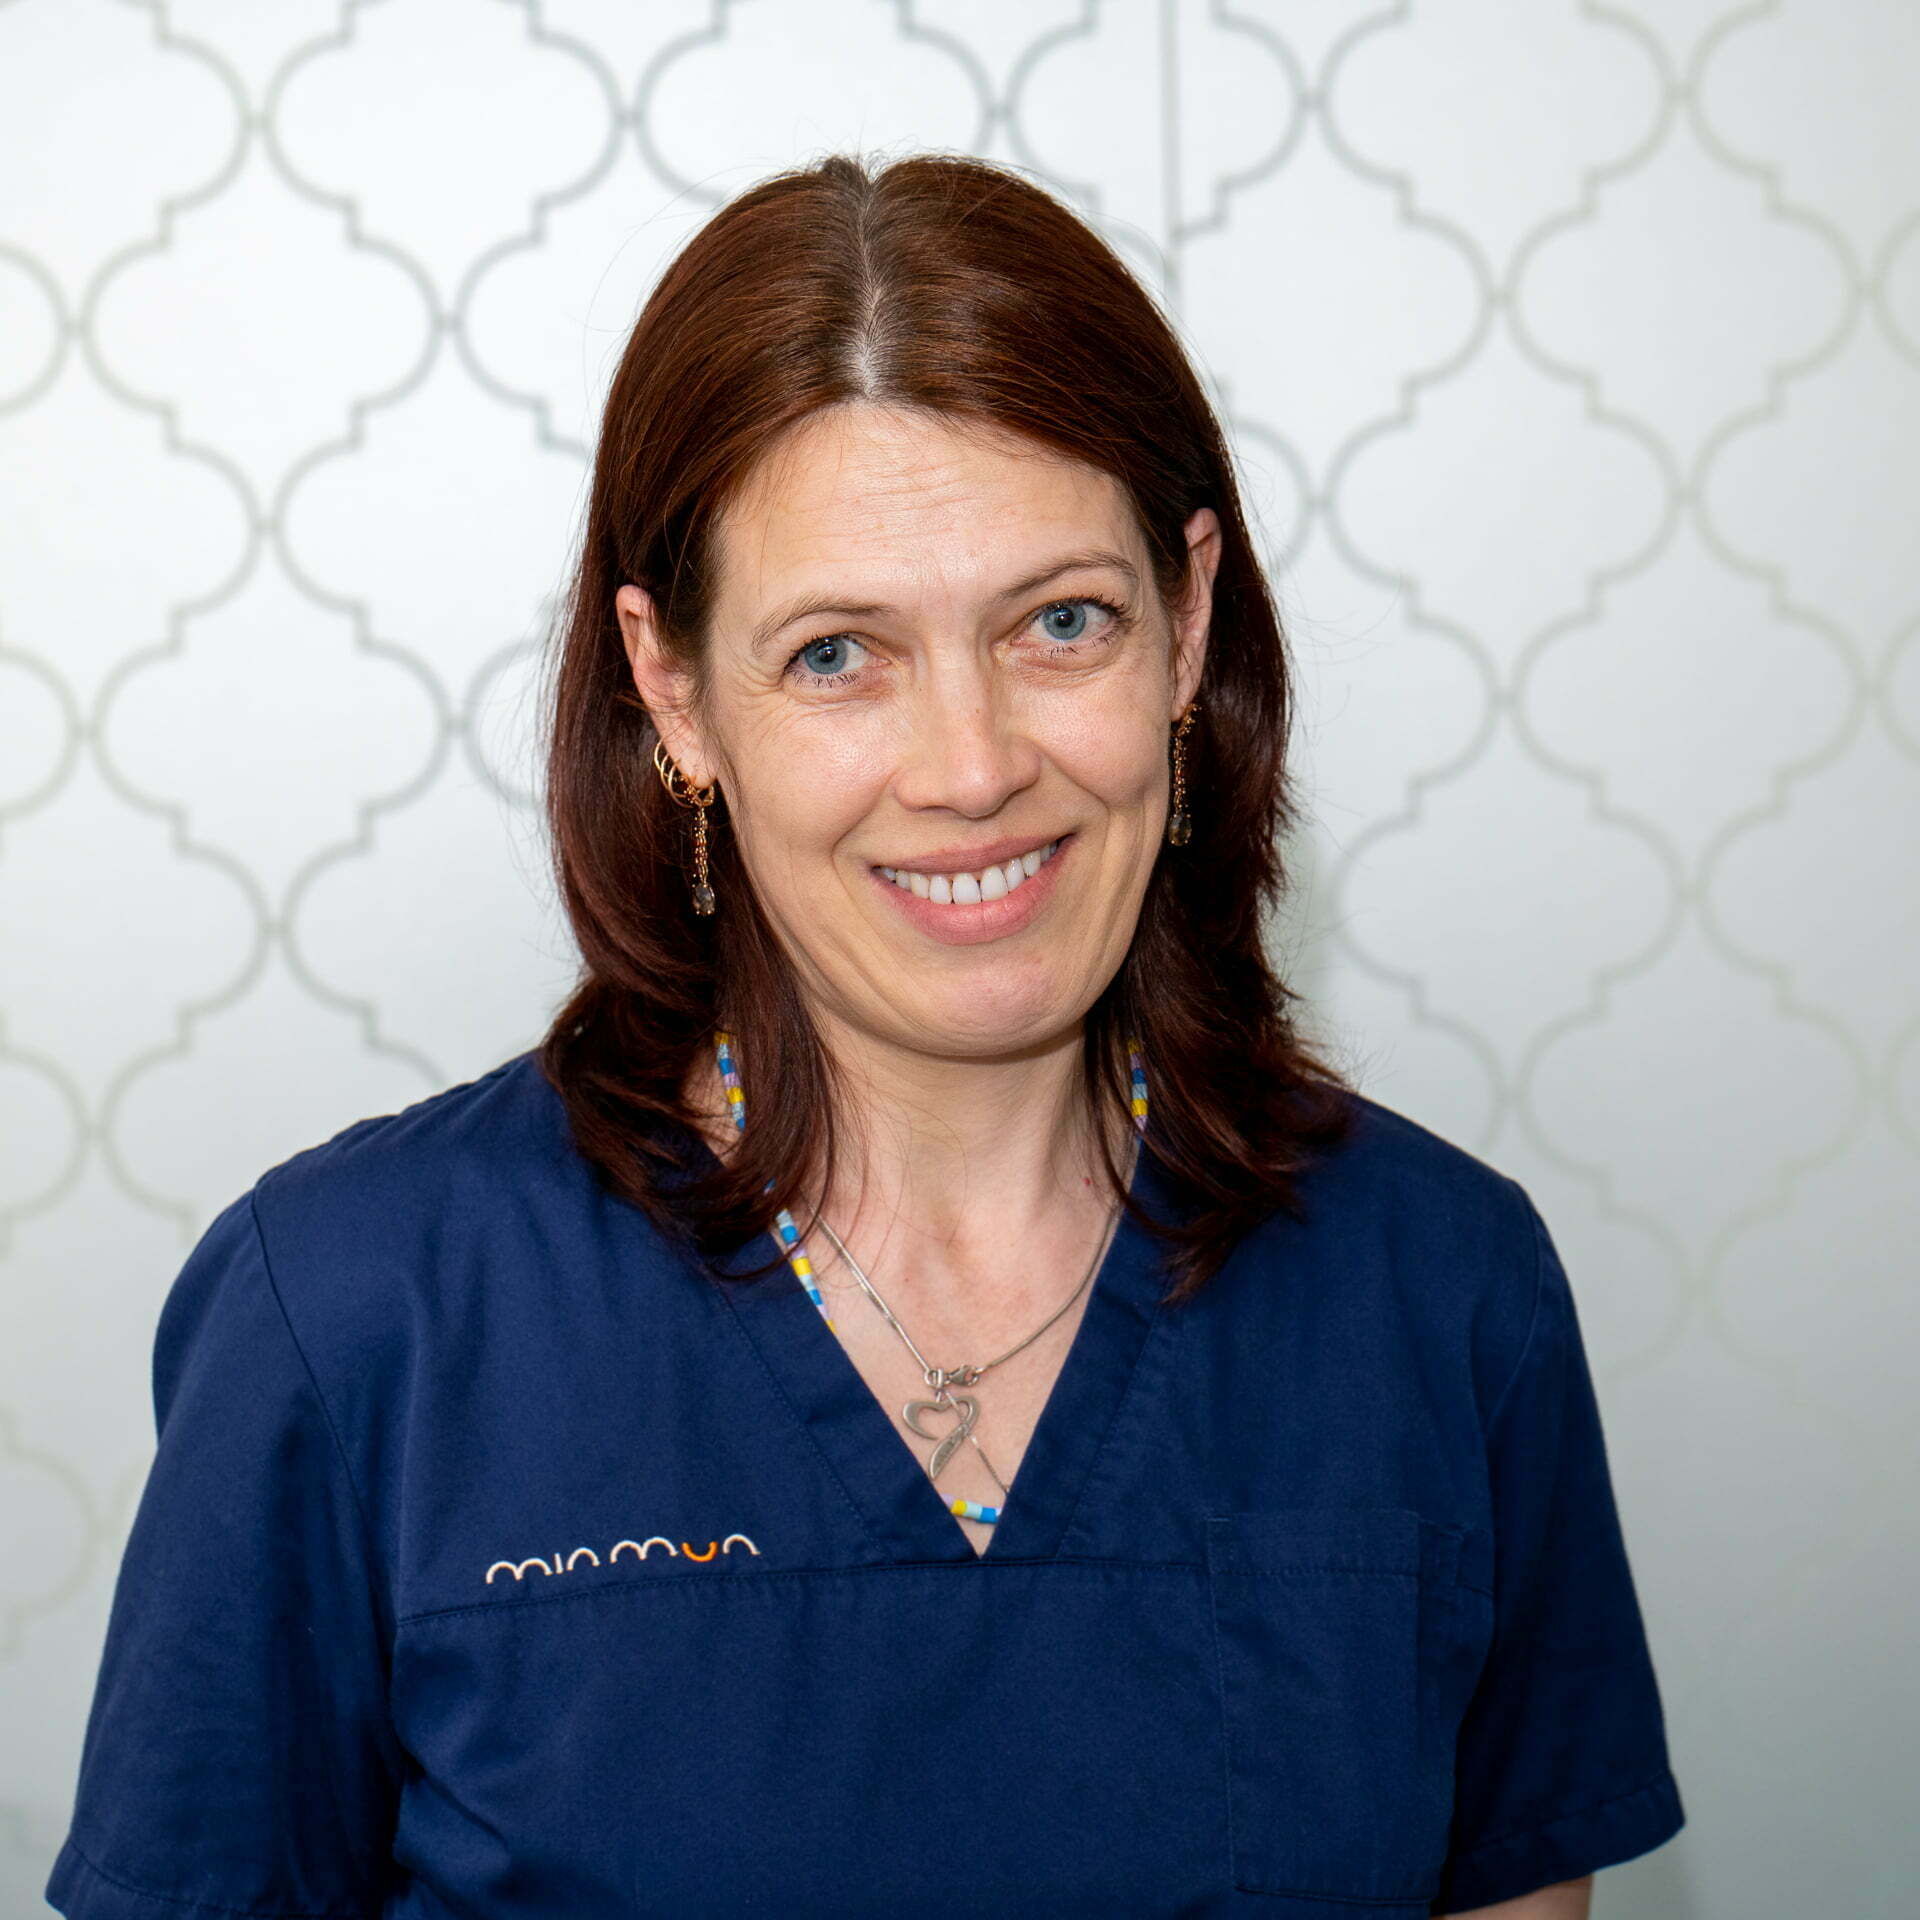 Leg. Tandhygienist Ana Condurache